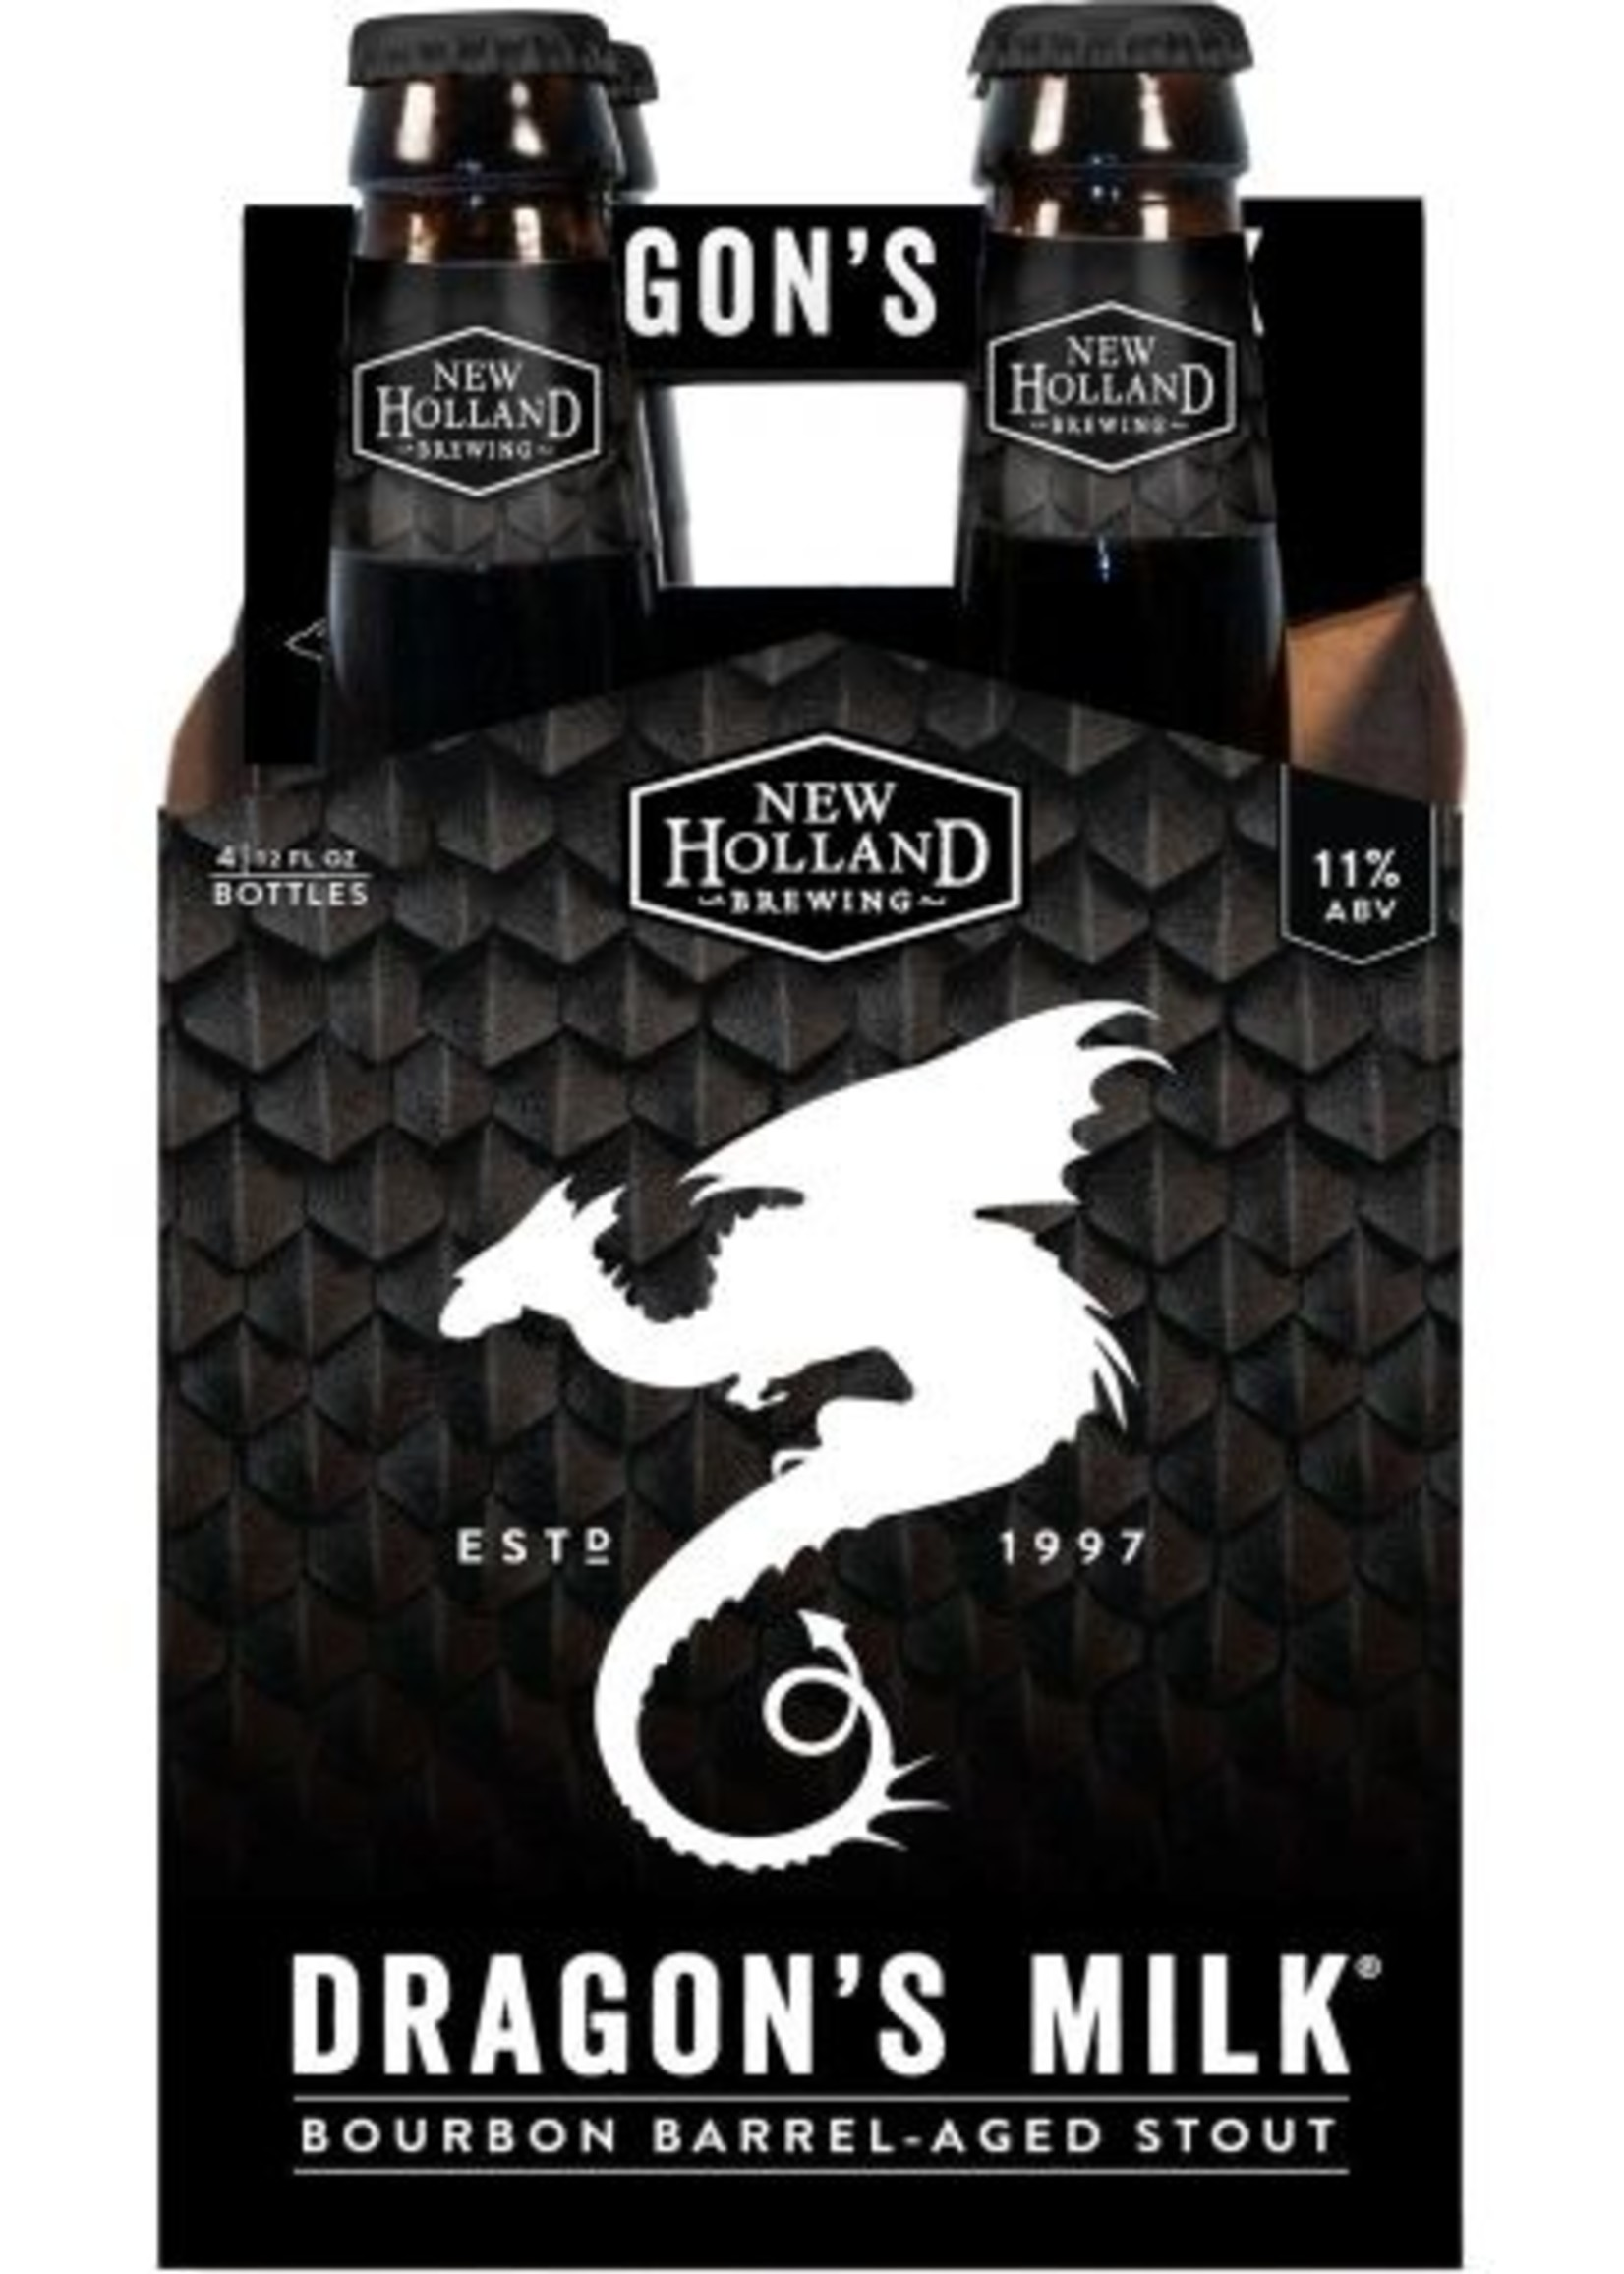 New Holland Dragons Milk 4x12oz Bottles